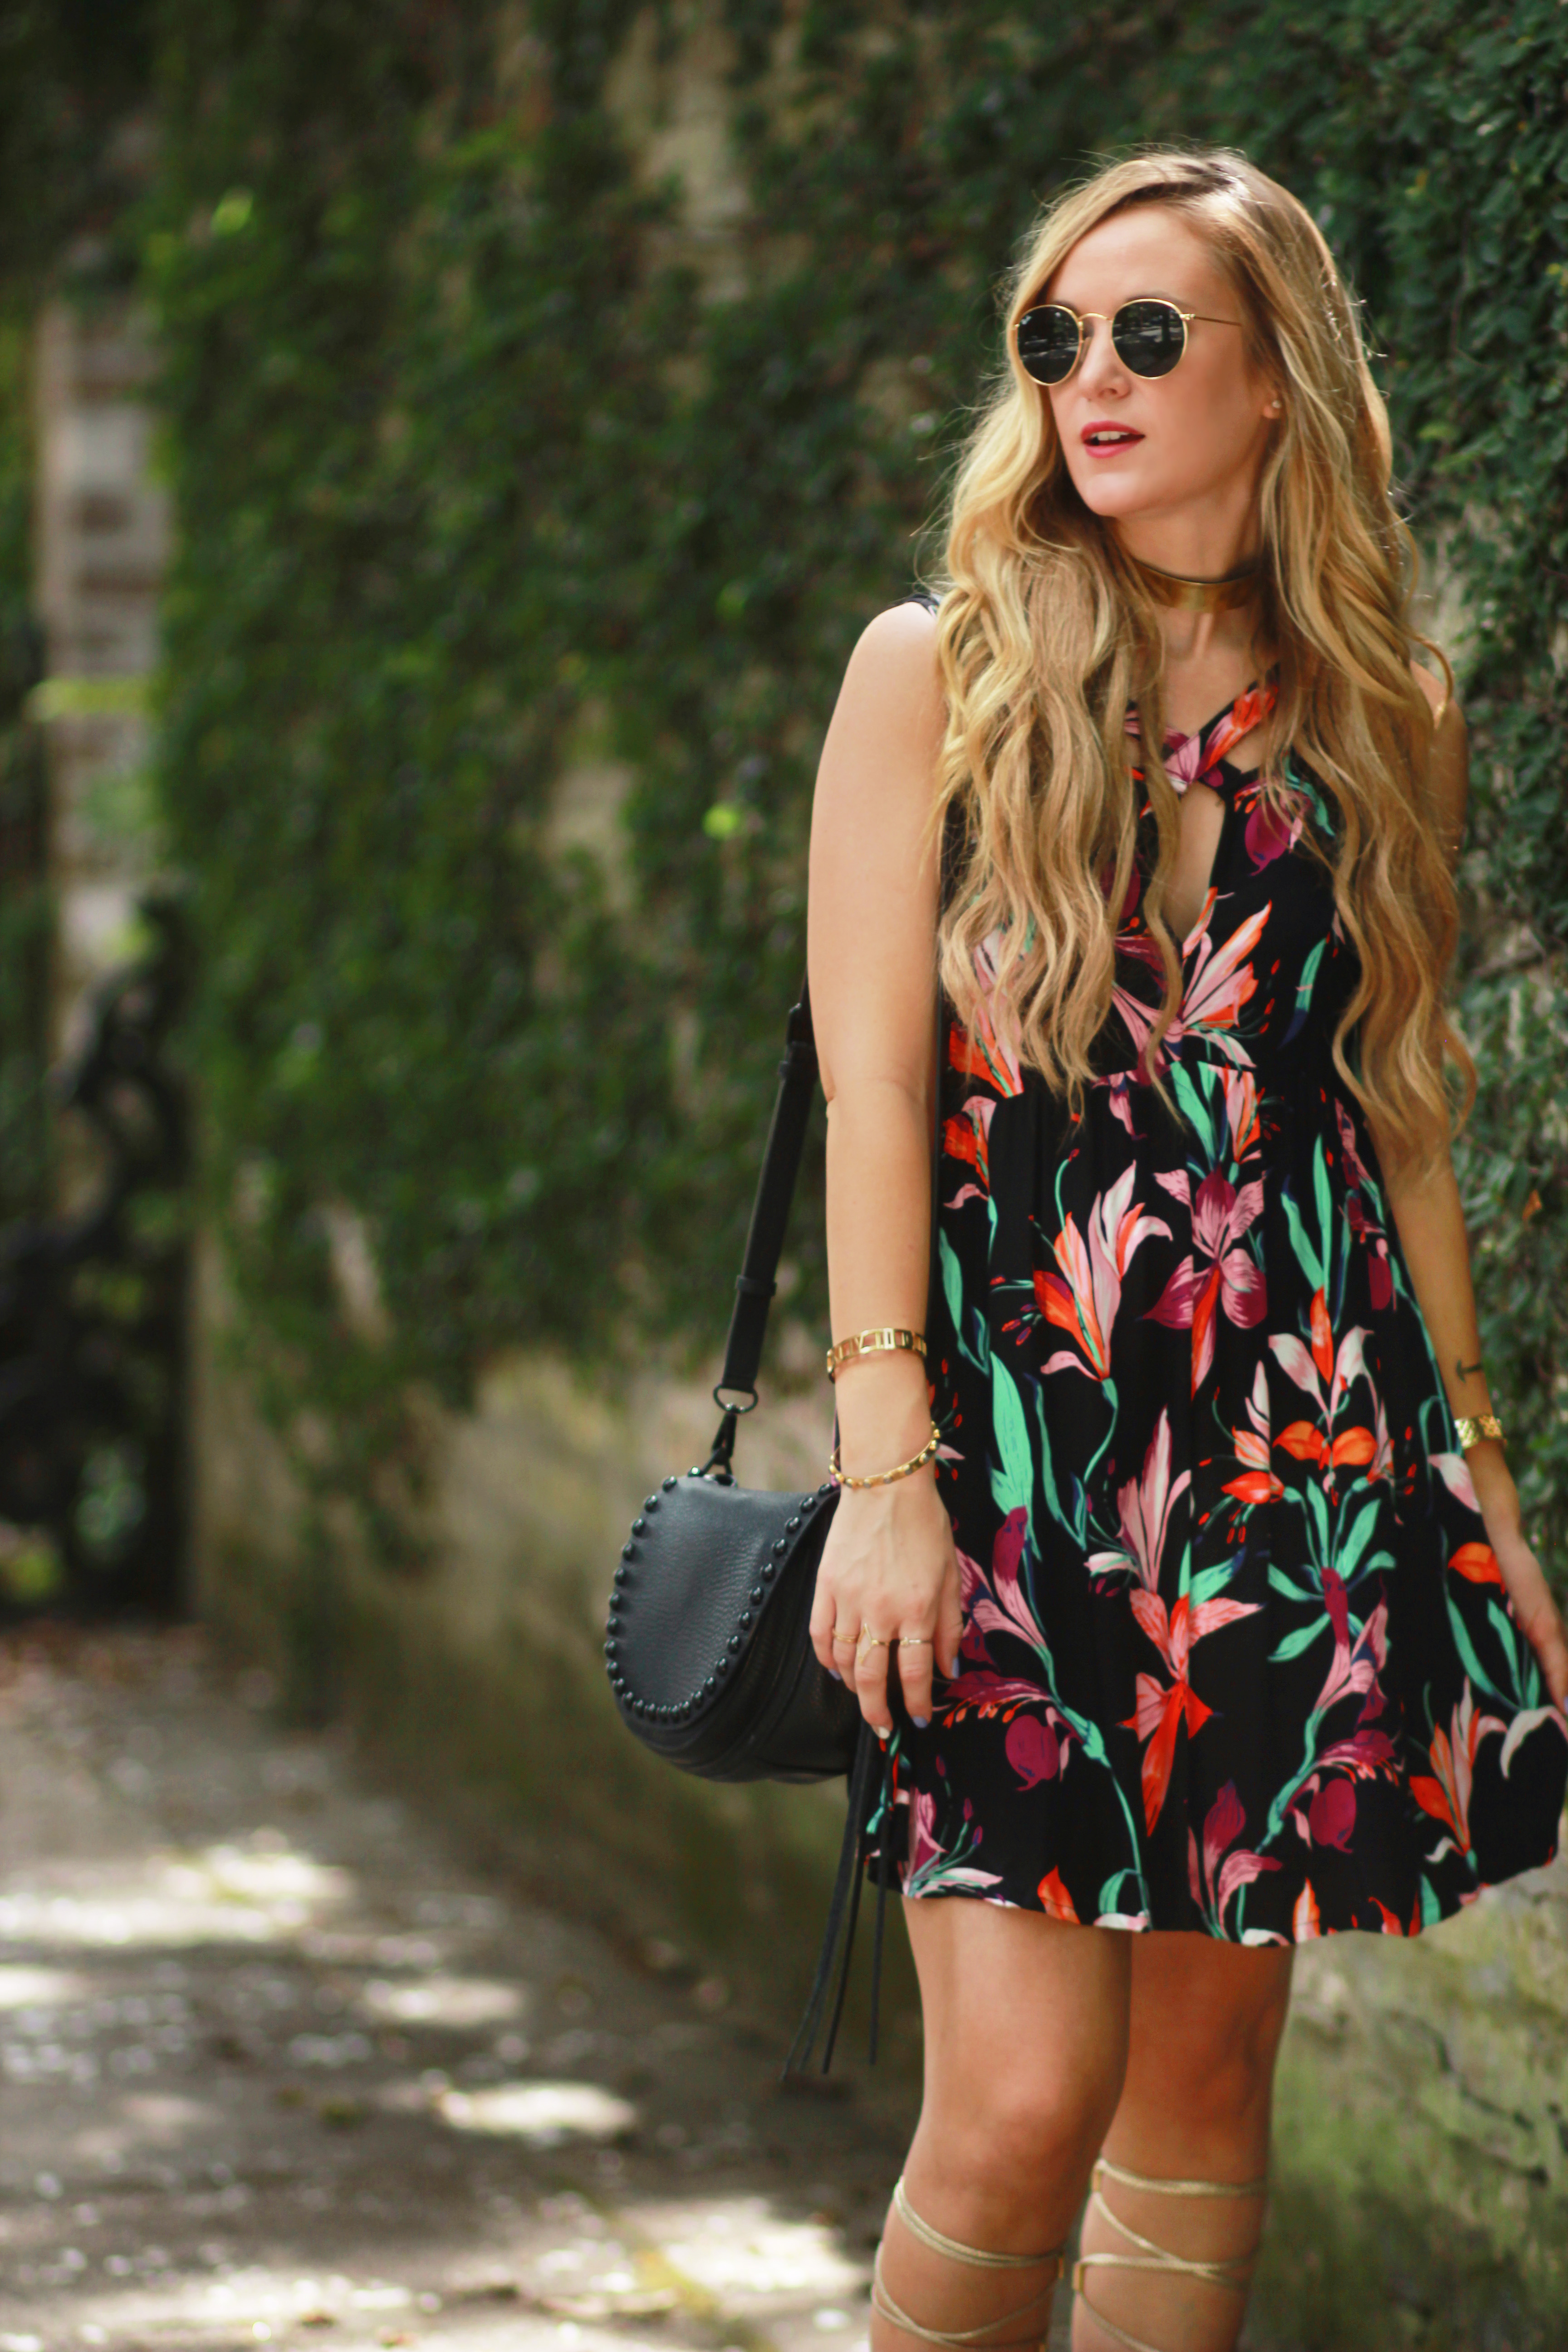 Boho Floral Dress | Upbeat Soles | Orlando Florida Fashion Blog